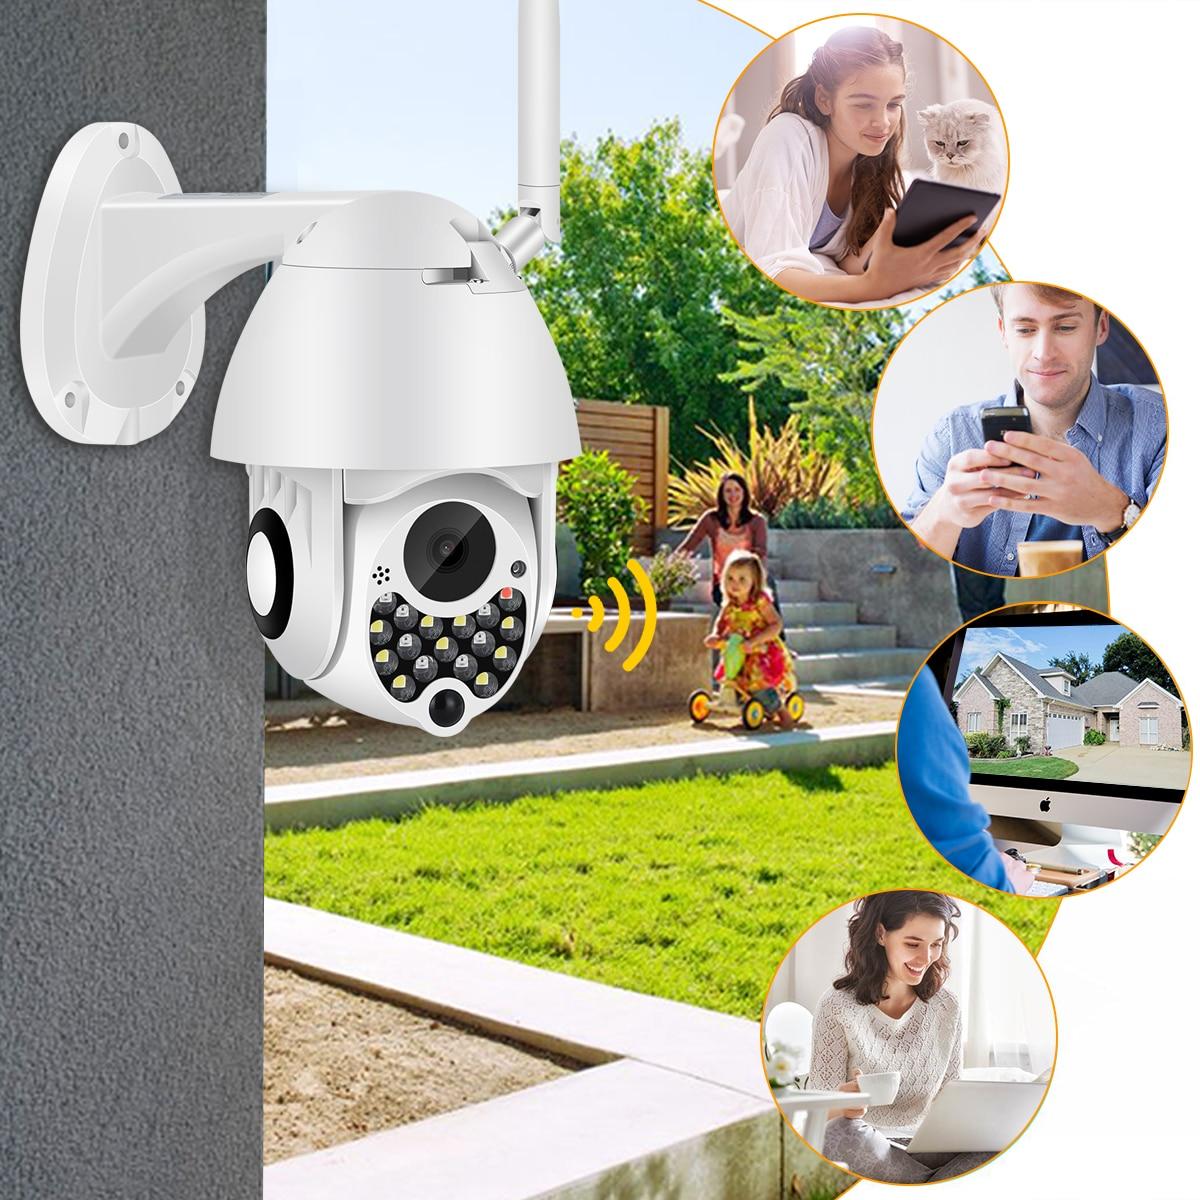 H8dd357bbc7d6403cbf36ca16f213851b7 1080P Outdoor Wifi PTZ Camera with Siren Light Auto Tracking Cloud Home Security IP Camera 2MP 4X Digital Zoom Speed Dome Camera